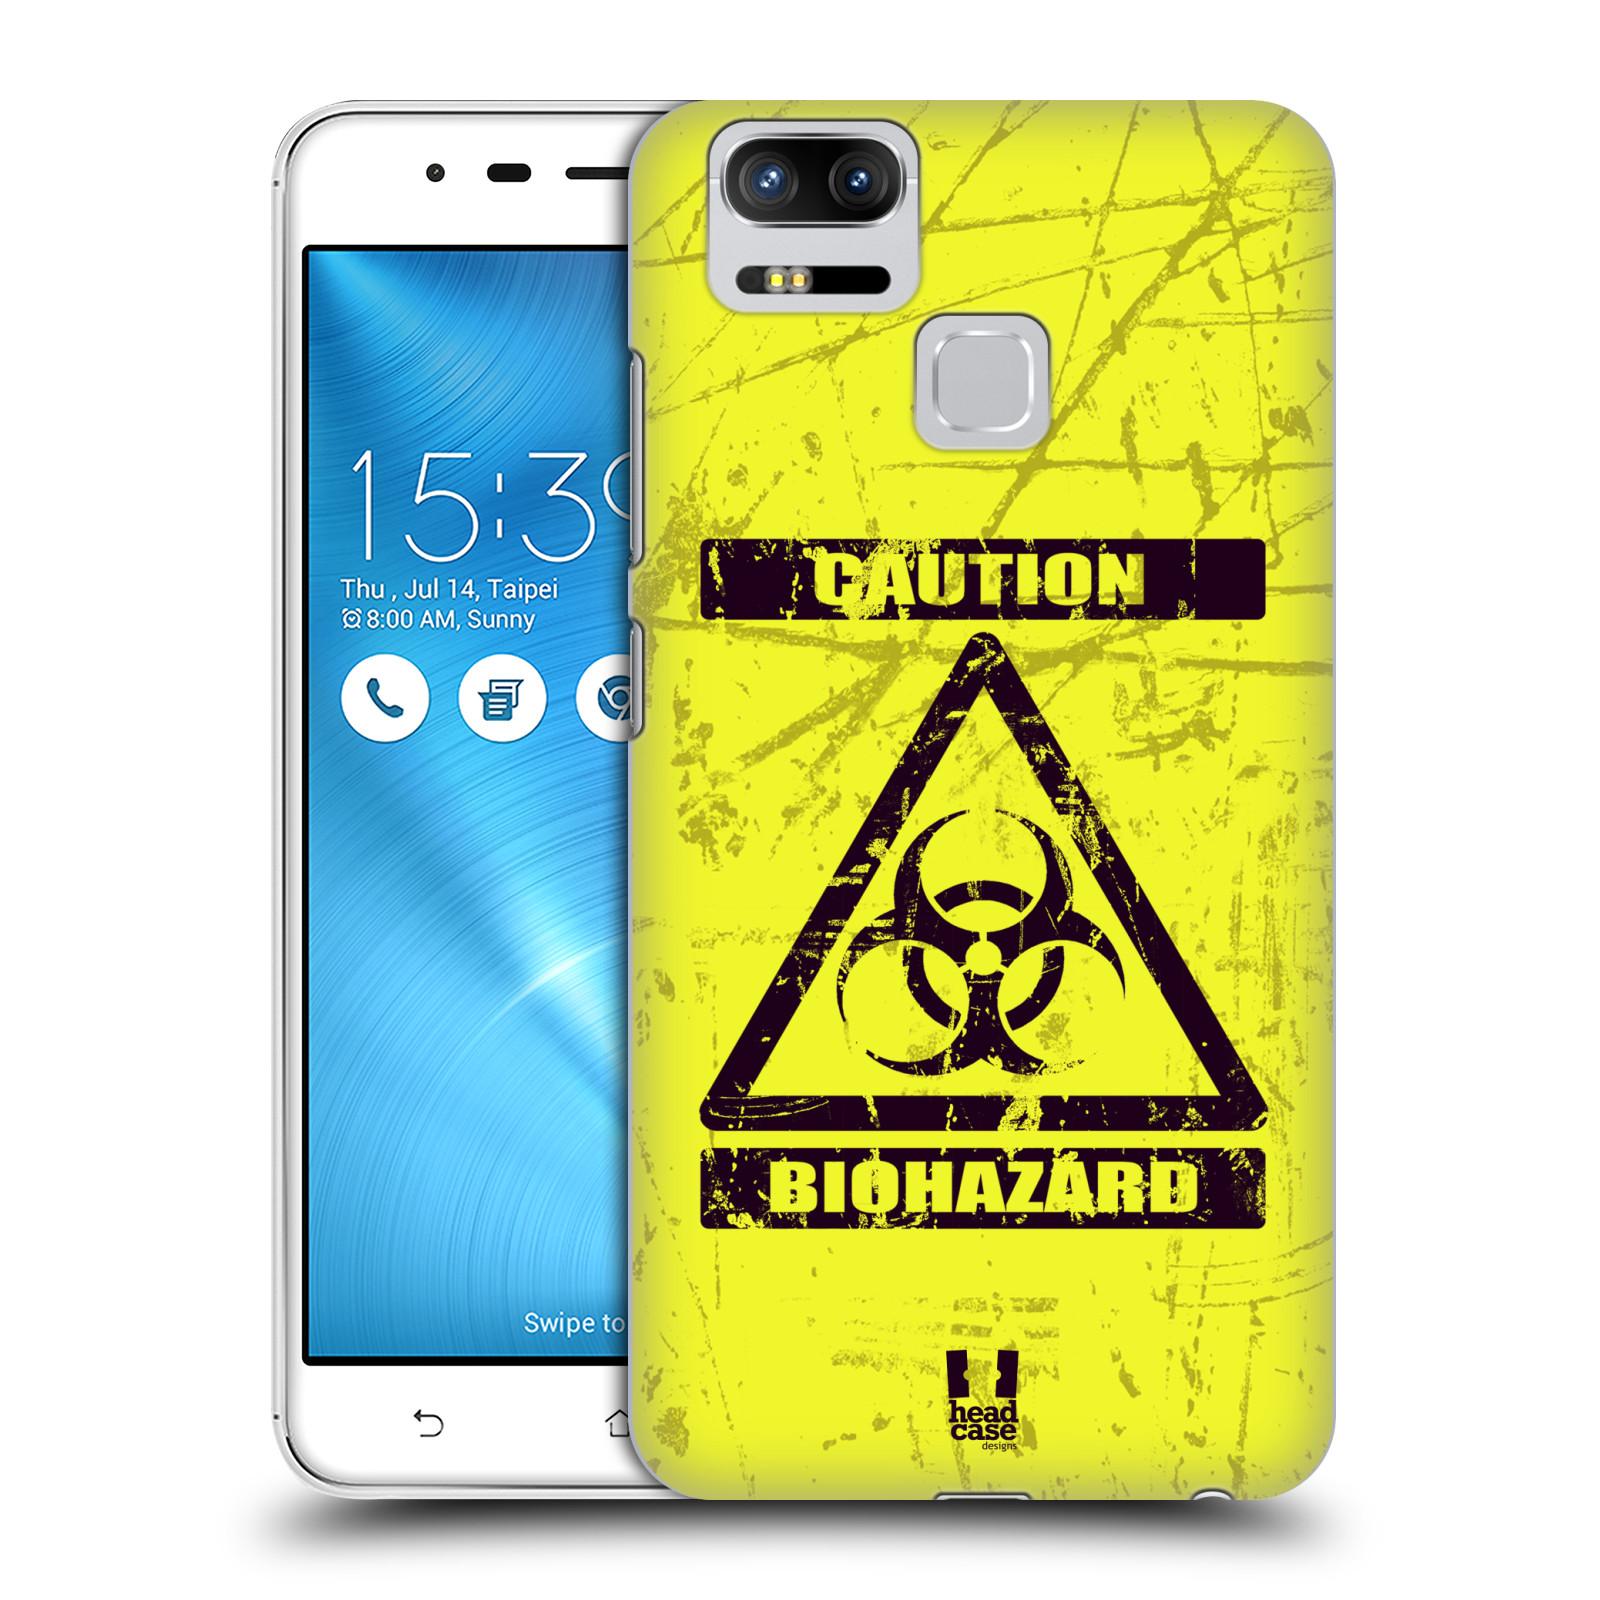 Plastové pouzdro na mobil Asus ZenFone 3 ZOOM ZE553KL - Head Case - BIOHAZARD (Plastový kryt či obal na mobilní telefon Asus ZenFone 3 ZOOM ZE553KL s motivem BIOHAZARD)